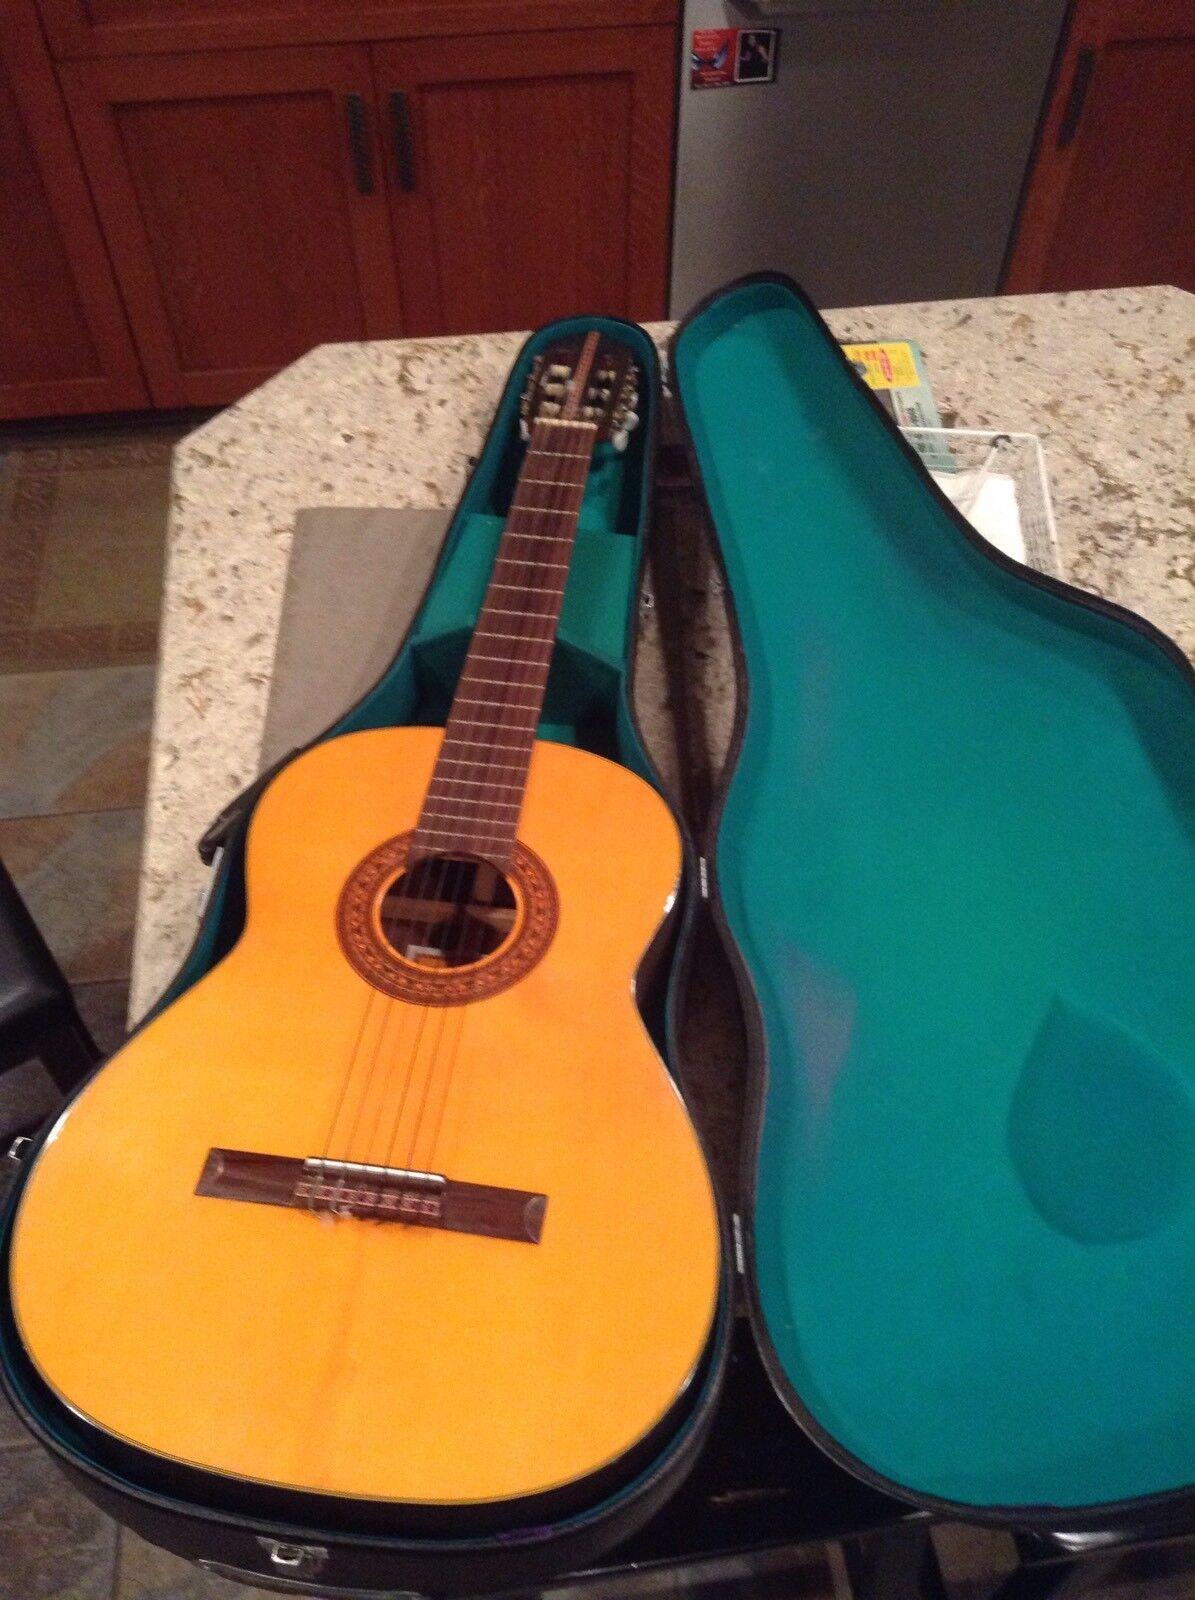 MARUHA HASHIMOTO CLASSICAL GUITAR  No.236 Rare Classic Guitar HARD CASE